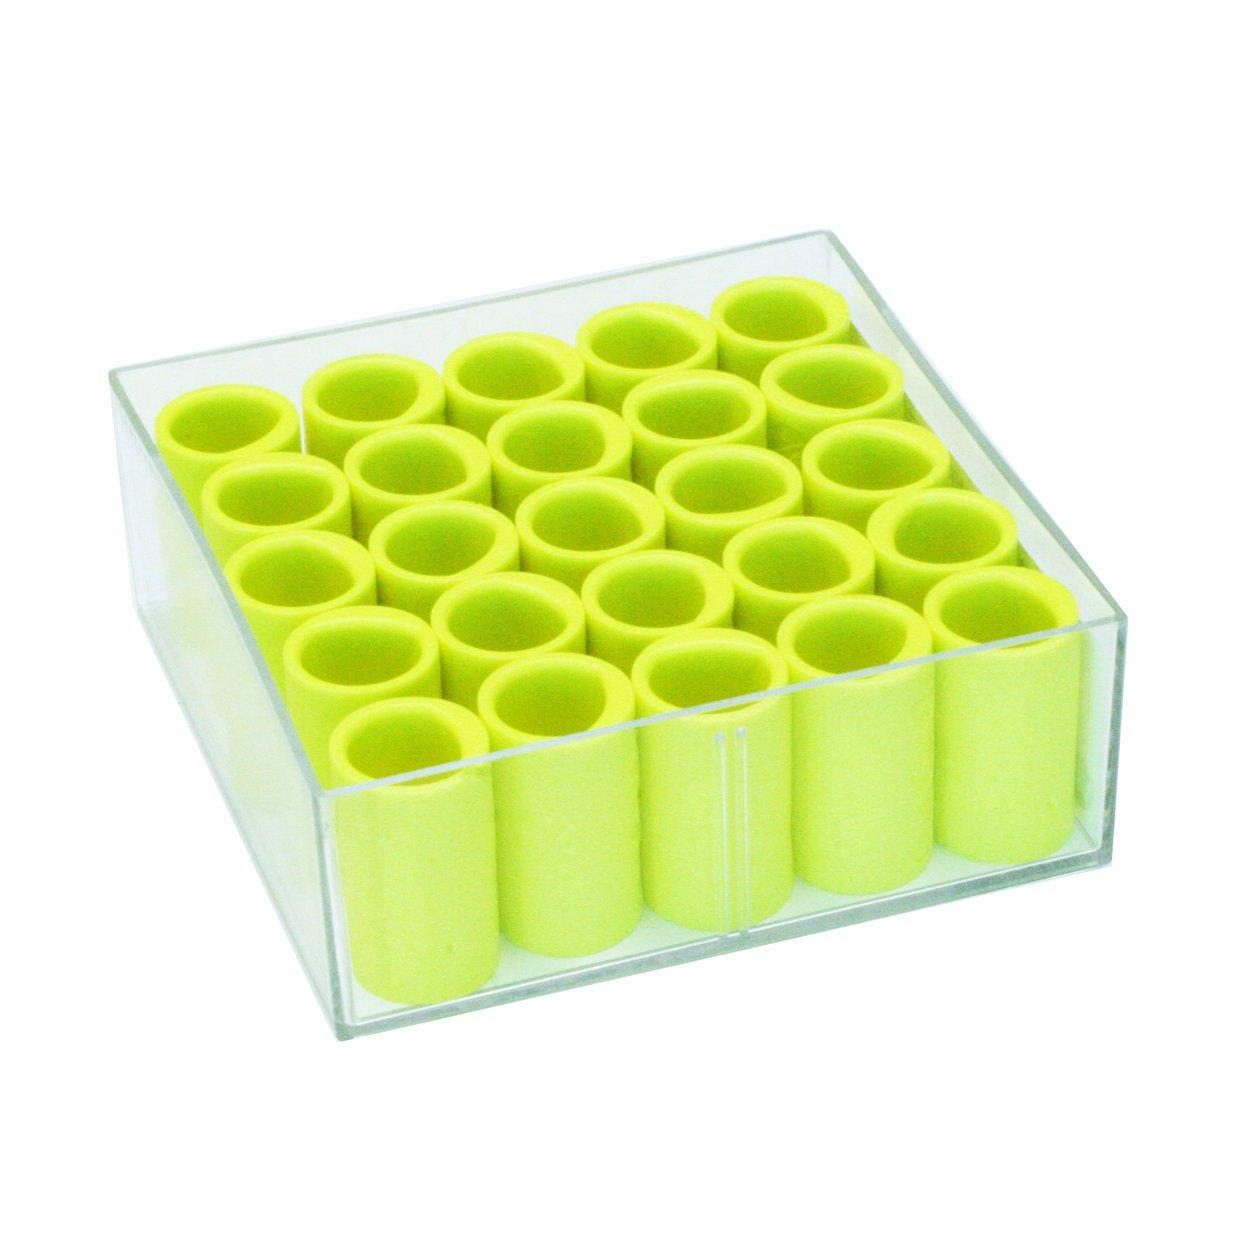 Vise Power Lift & Oval Finger Insert (Box of 25), Neon Yellow, 3/4